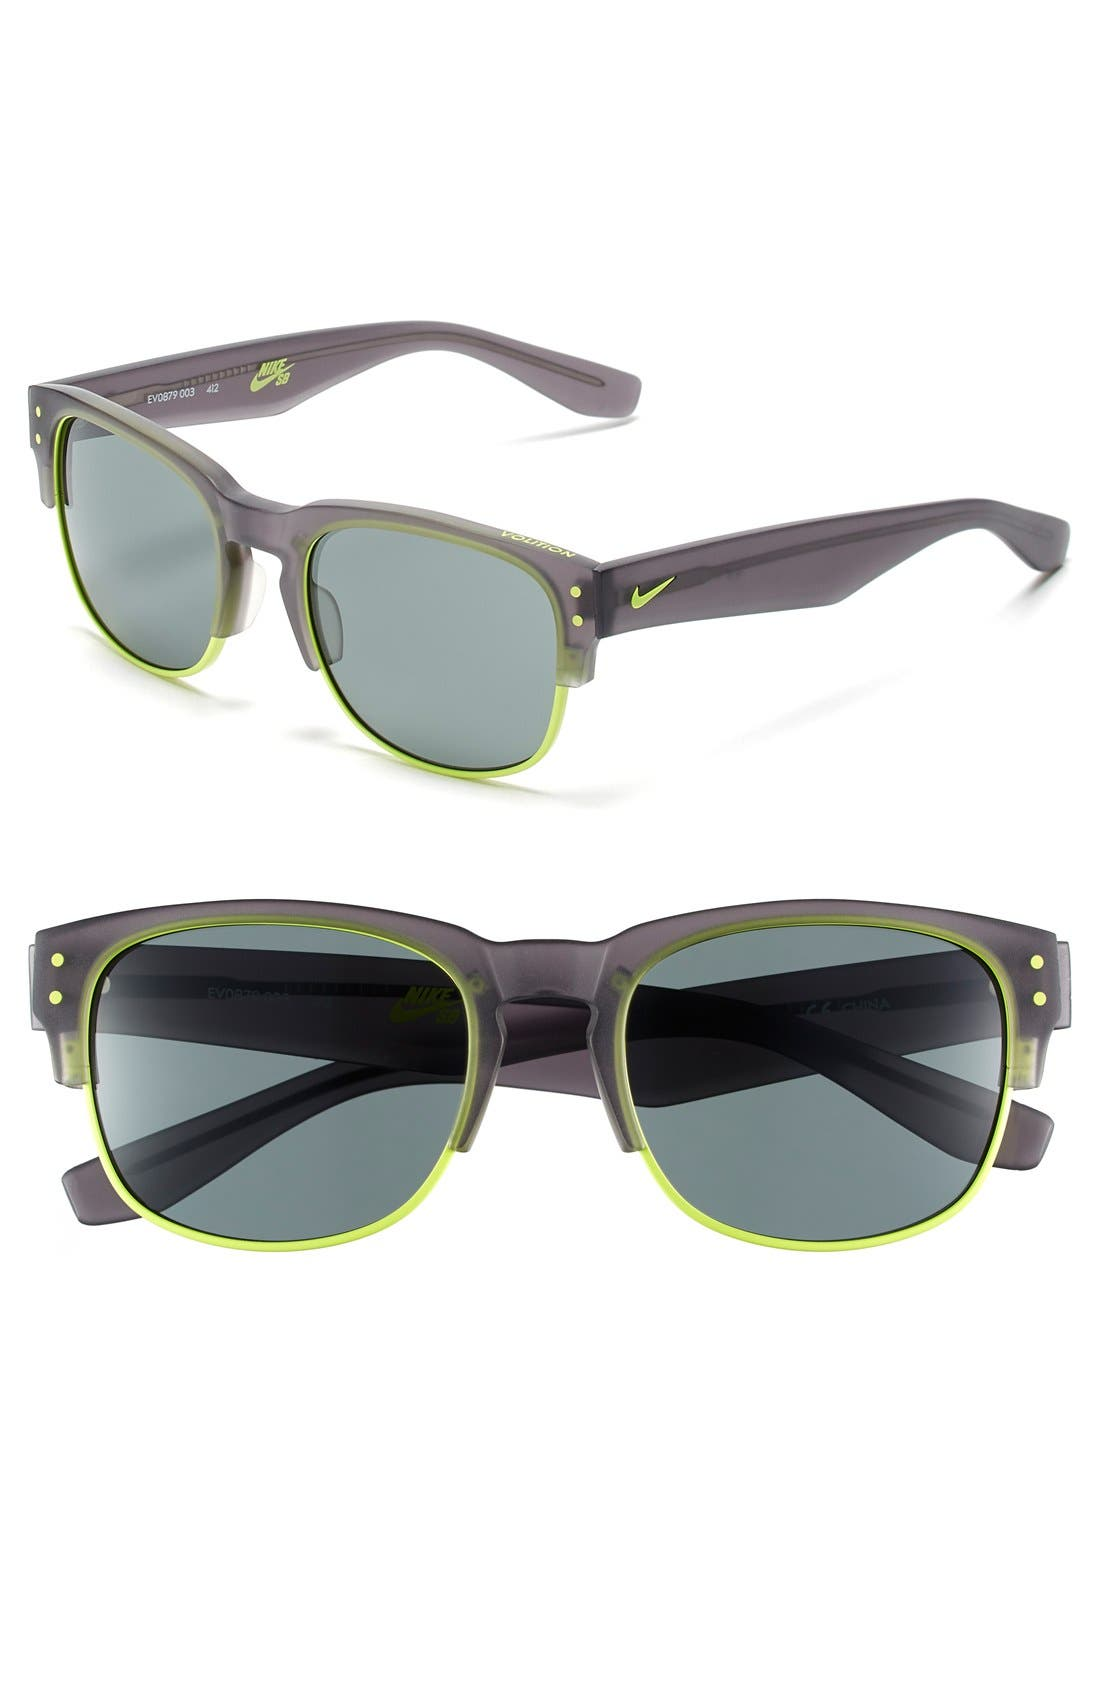 Main Image - Nike Volition 54mm Sunglasses